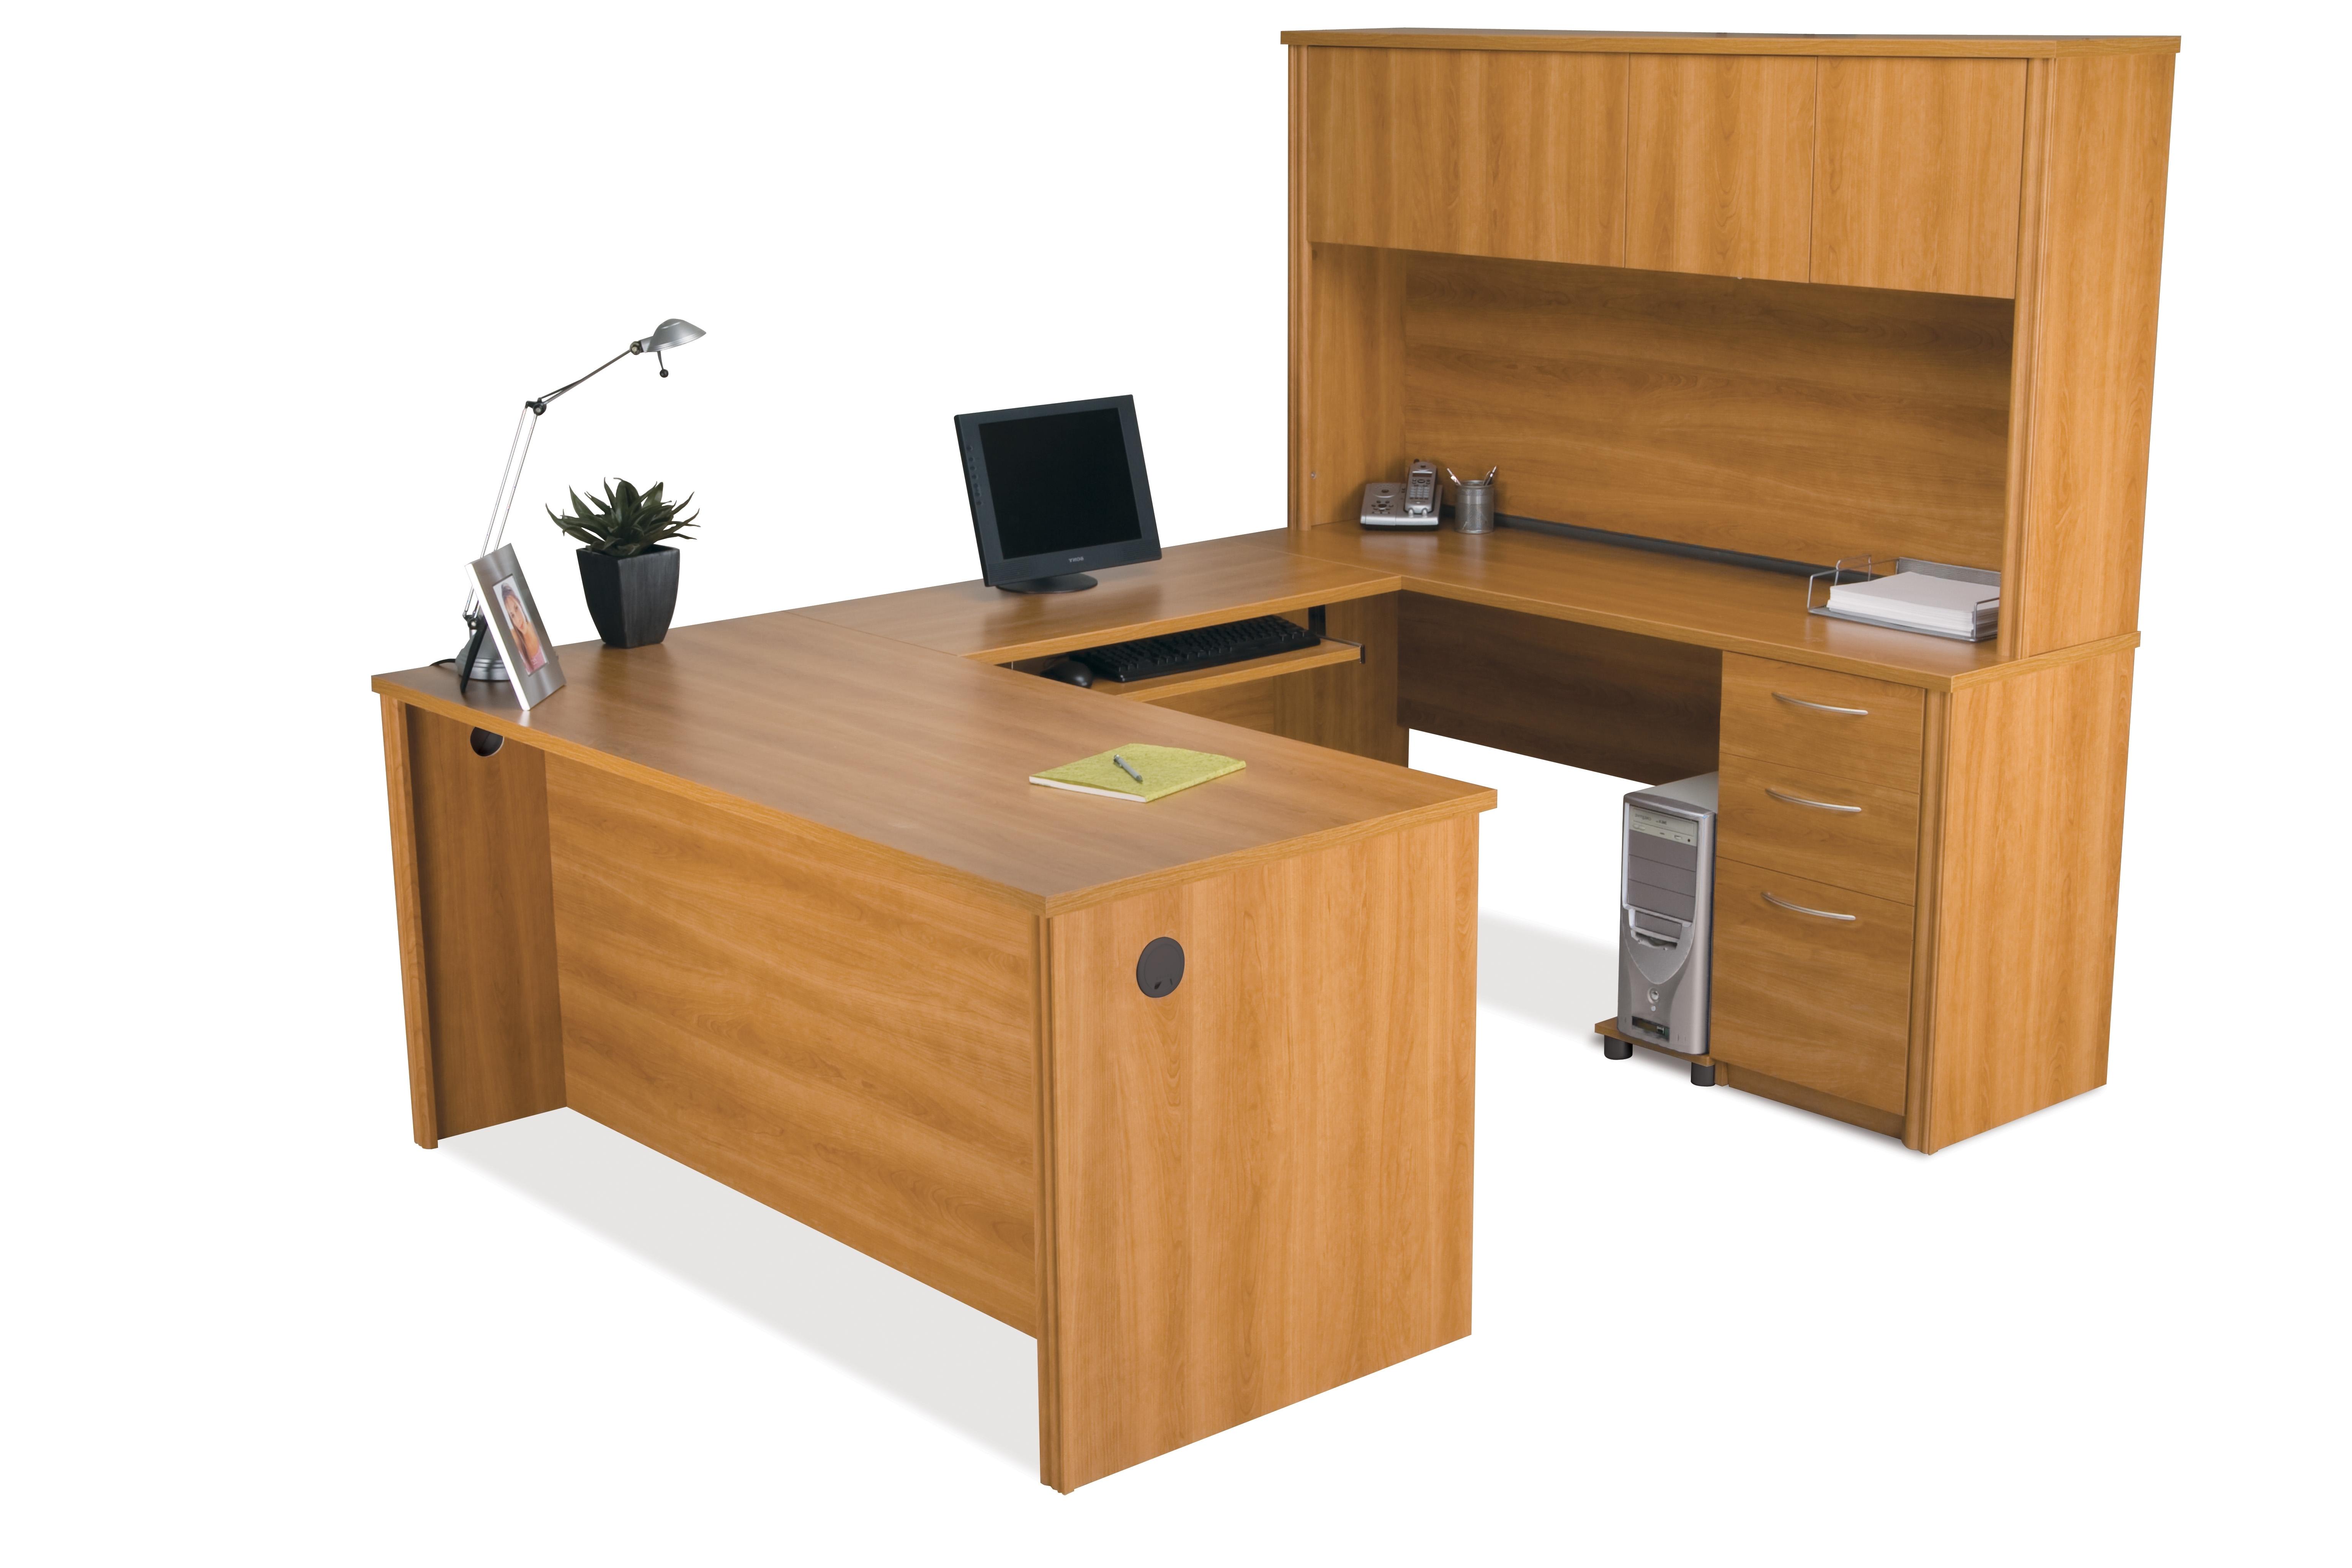 Fashionable U Shaped Computer Desks In Bestar Embassy U Shaped Computer Desk And Hutch (View 5 of 20)